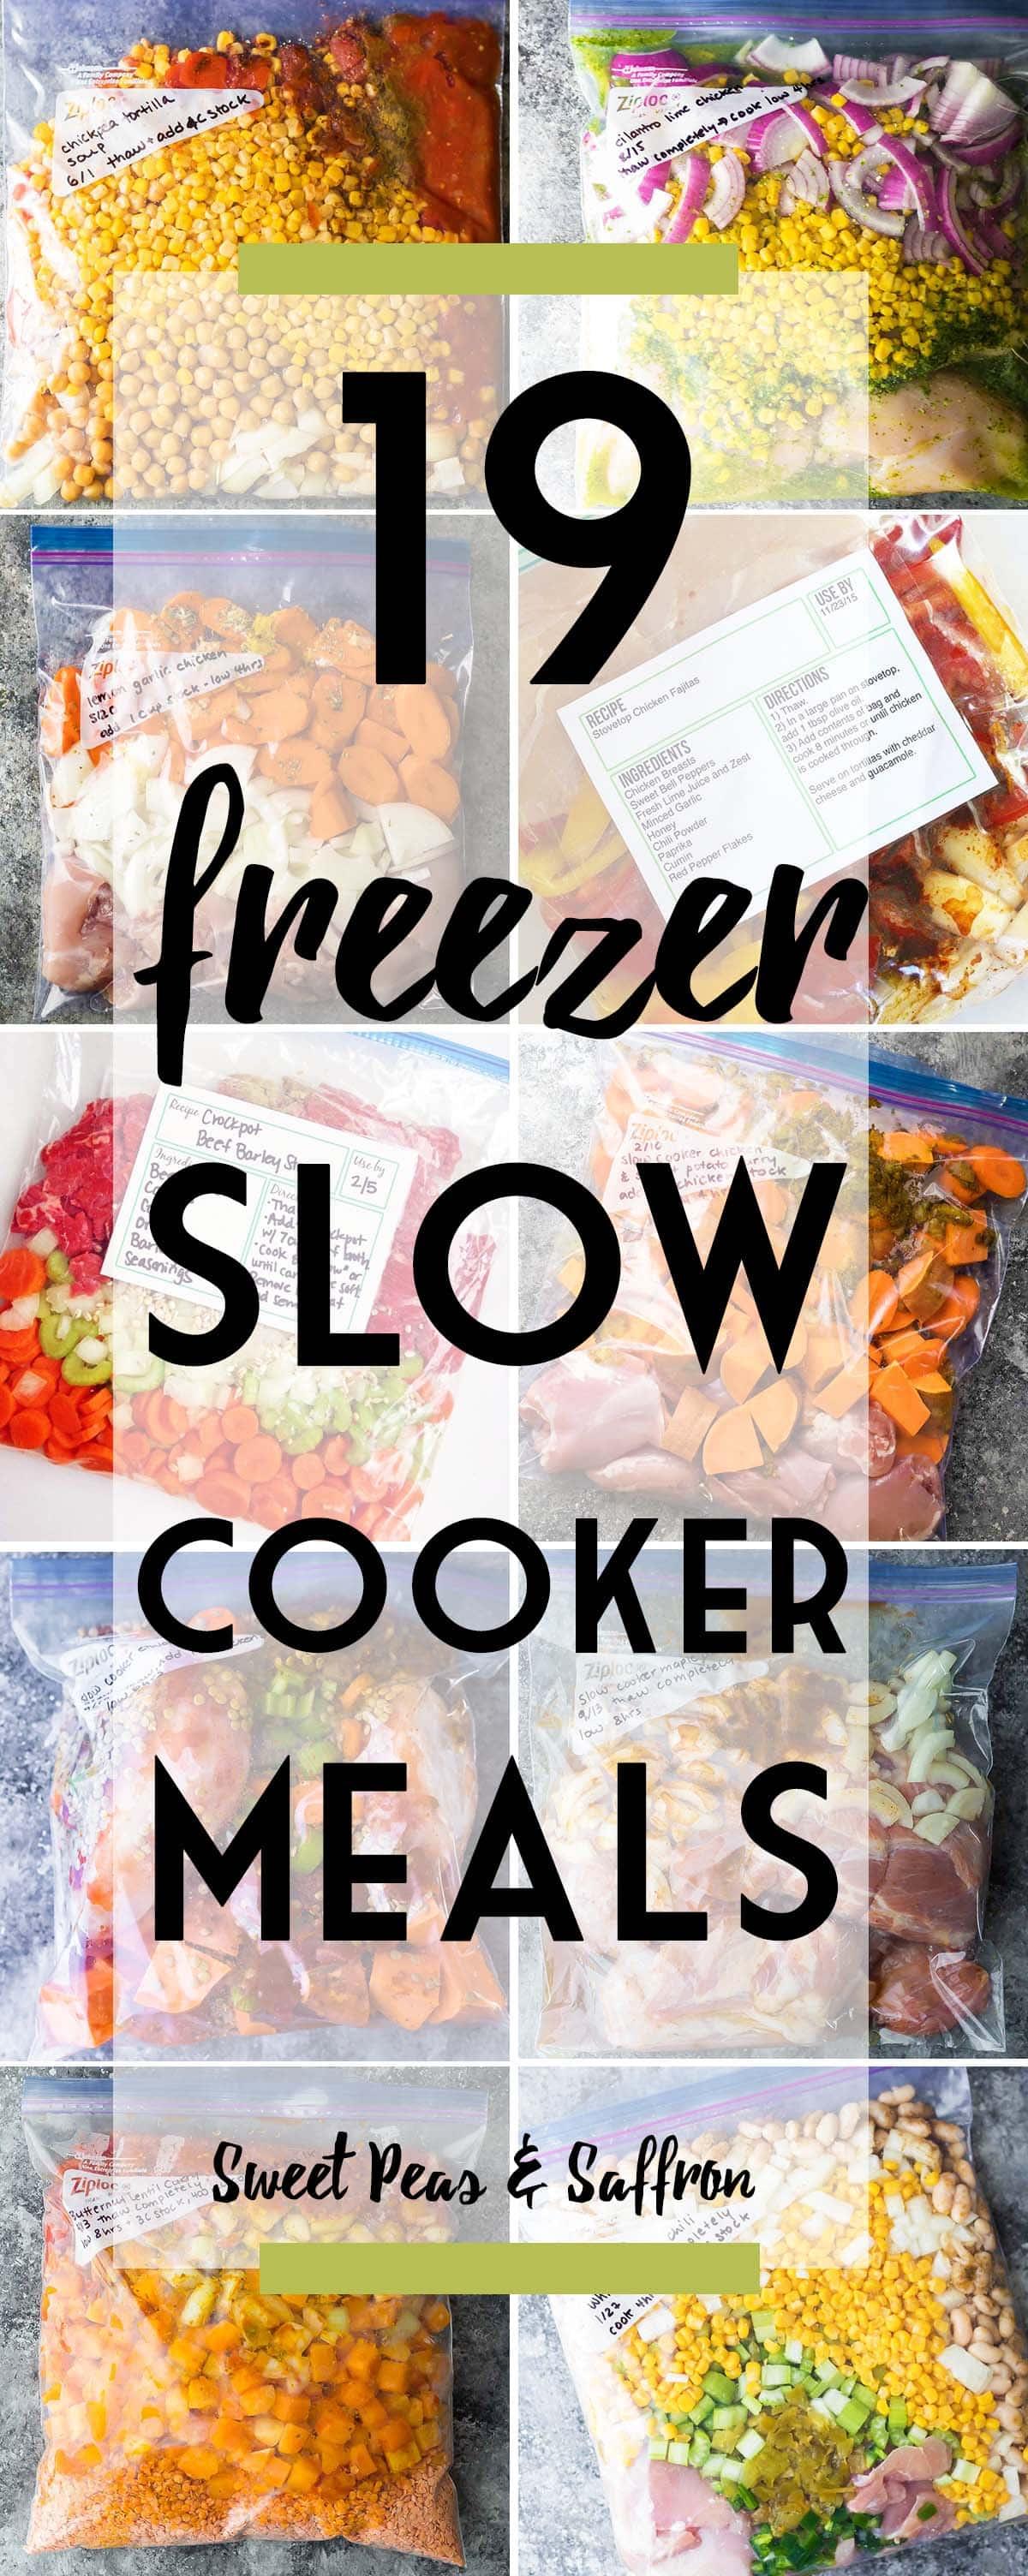 27 Healthy Crockpot Freezer Meals for Effortless Weeknights images